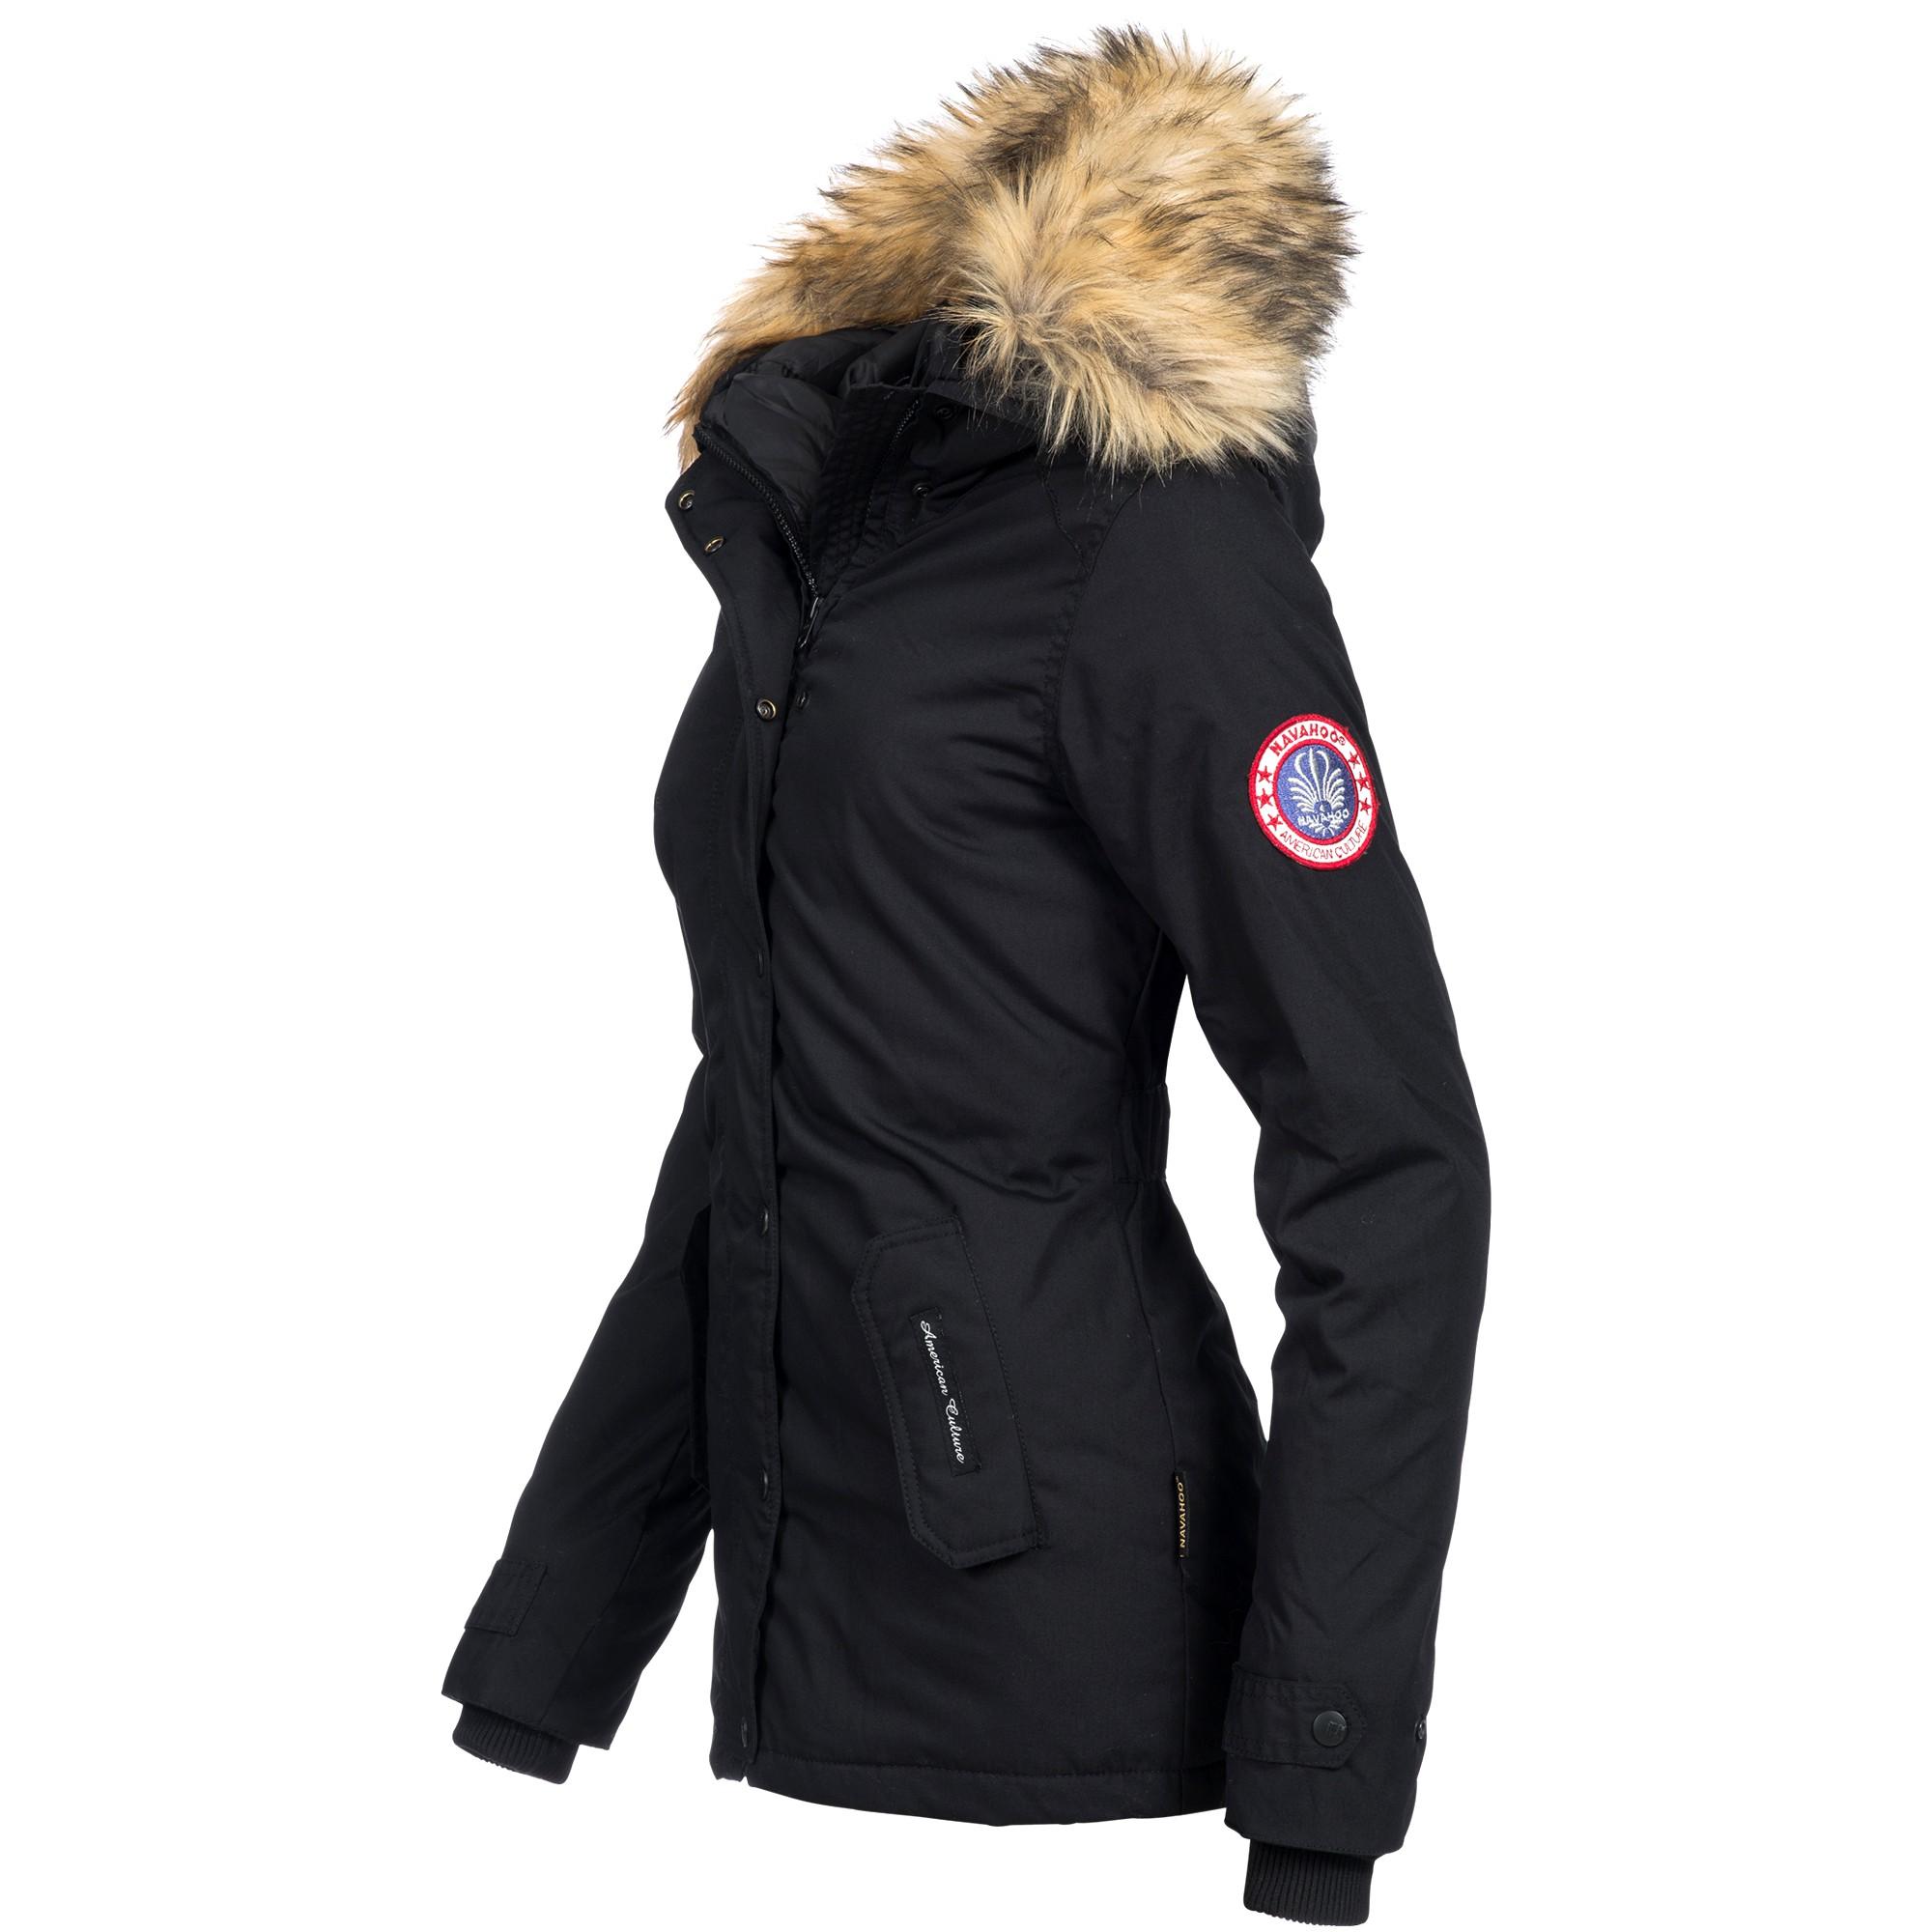 40e97013e827b4 Navahoo LAURA-1 Damen Jacke Parka Mantel Winterjacke Kapuze super warm  XS-XXL | Ausnahme Zustand Shop